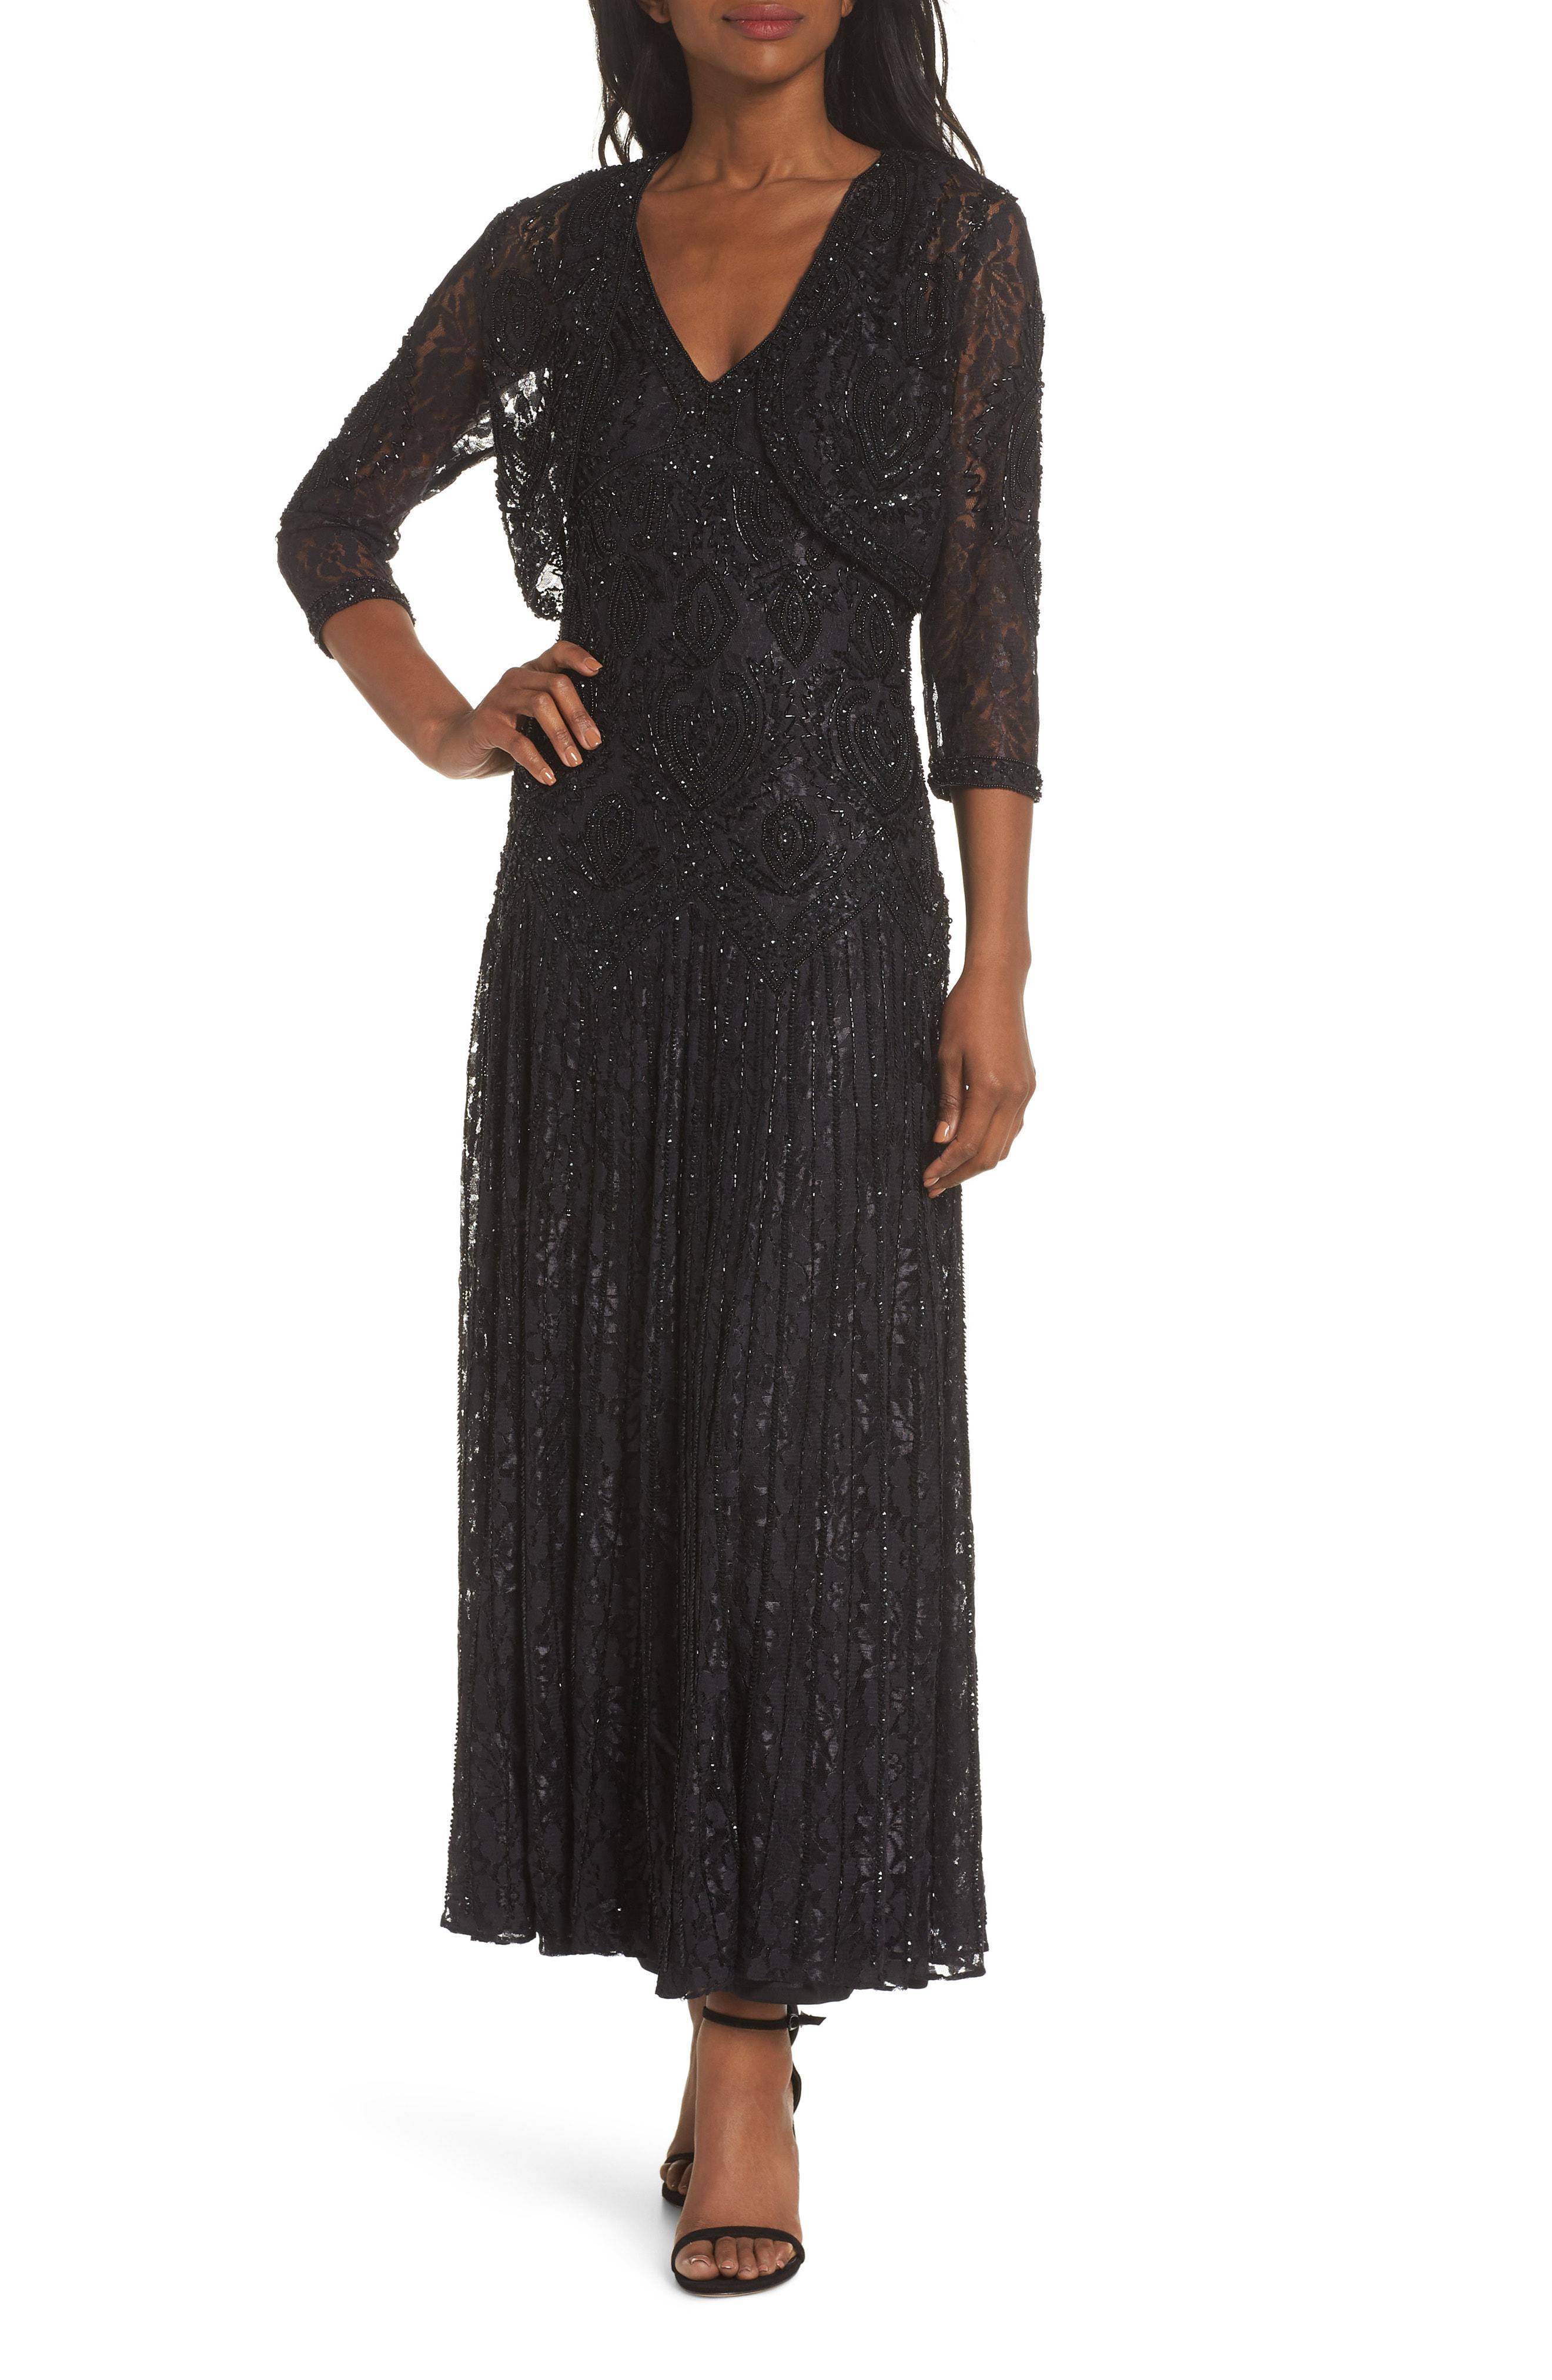 4db3d3c35ef Lyst - Pisarro Nights Beaded Lace Evening Dress With Bolero in Black